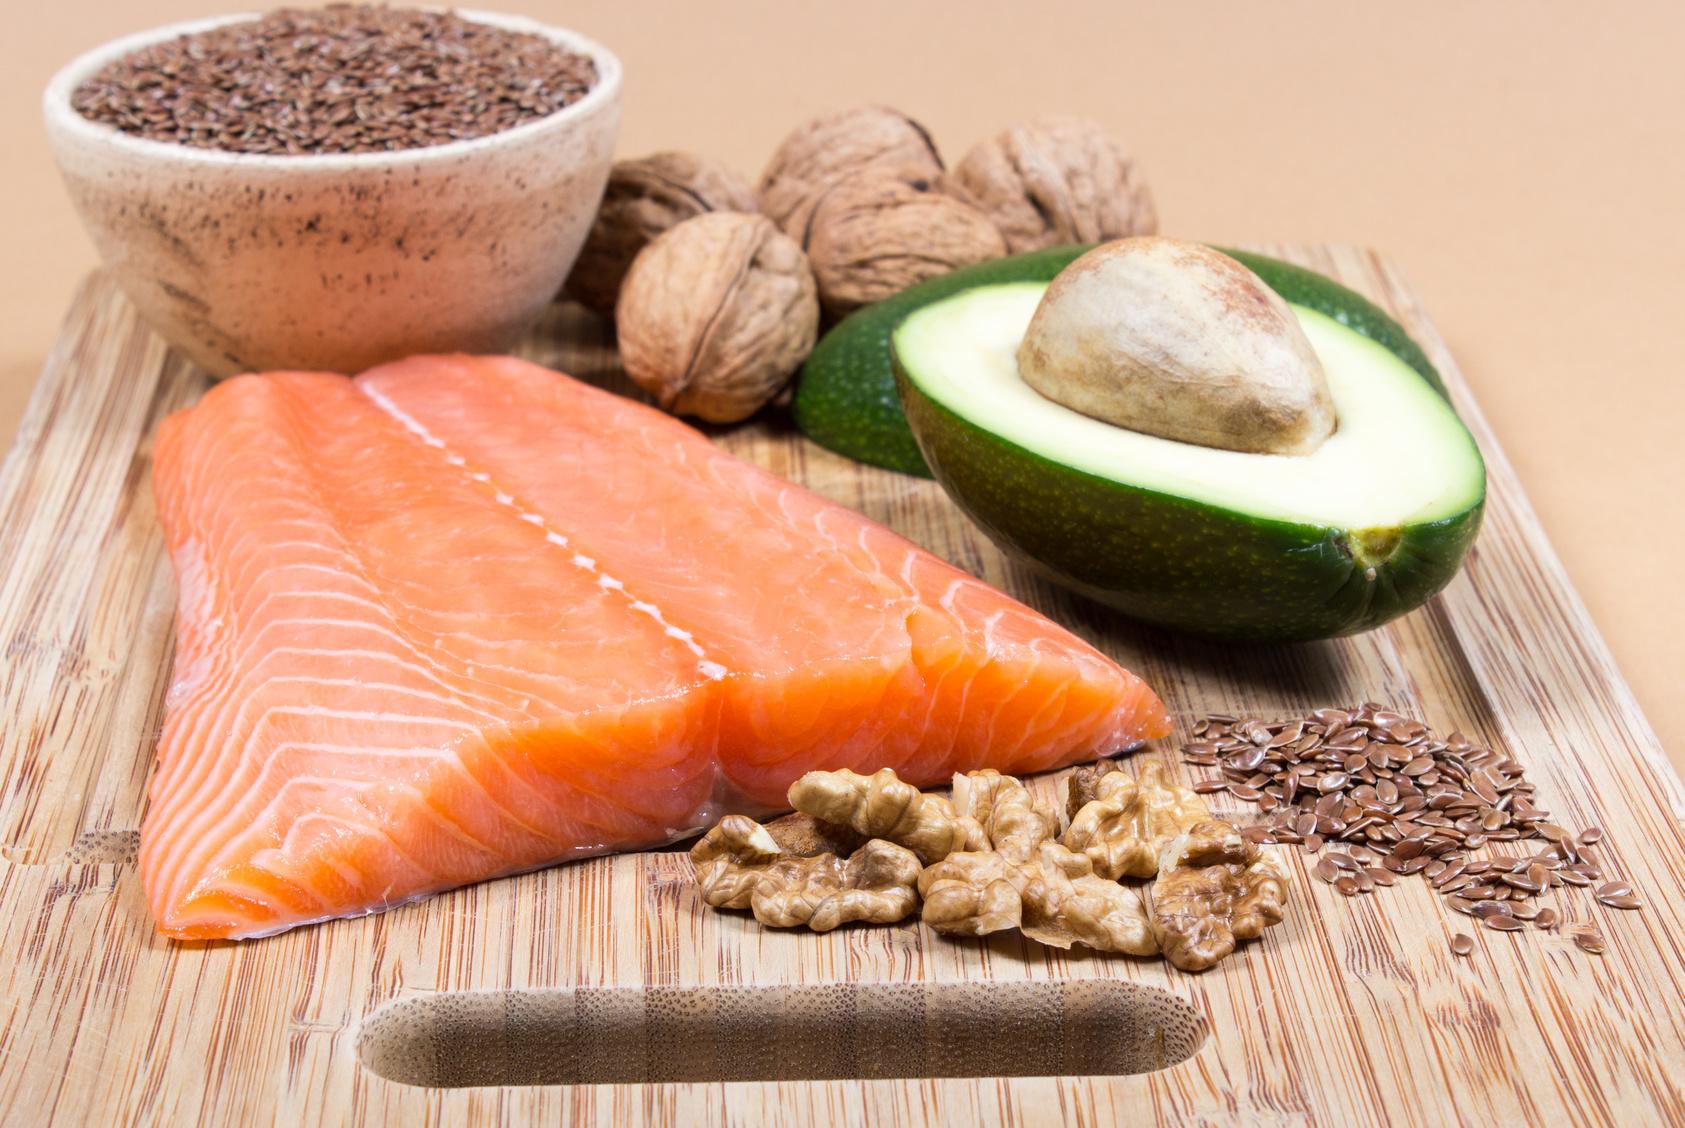 Figura 16 - Alimenti ricchi in omega 3